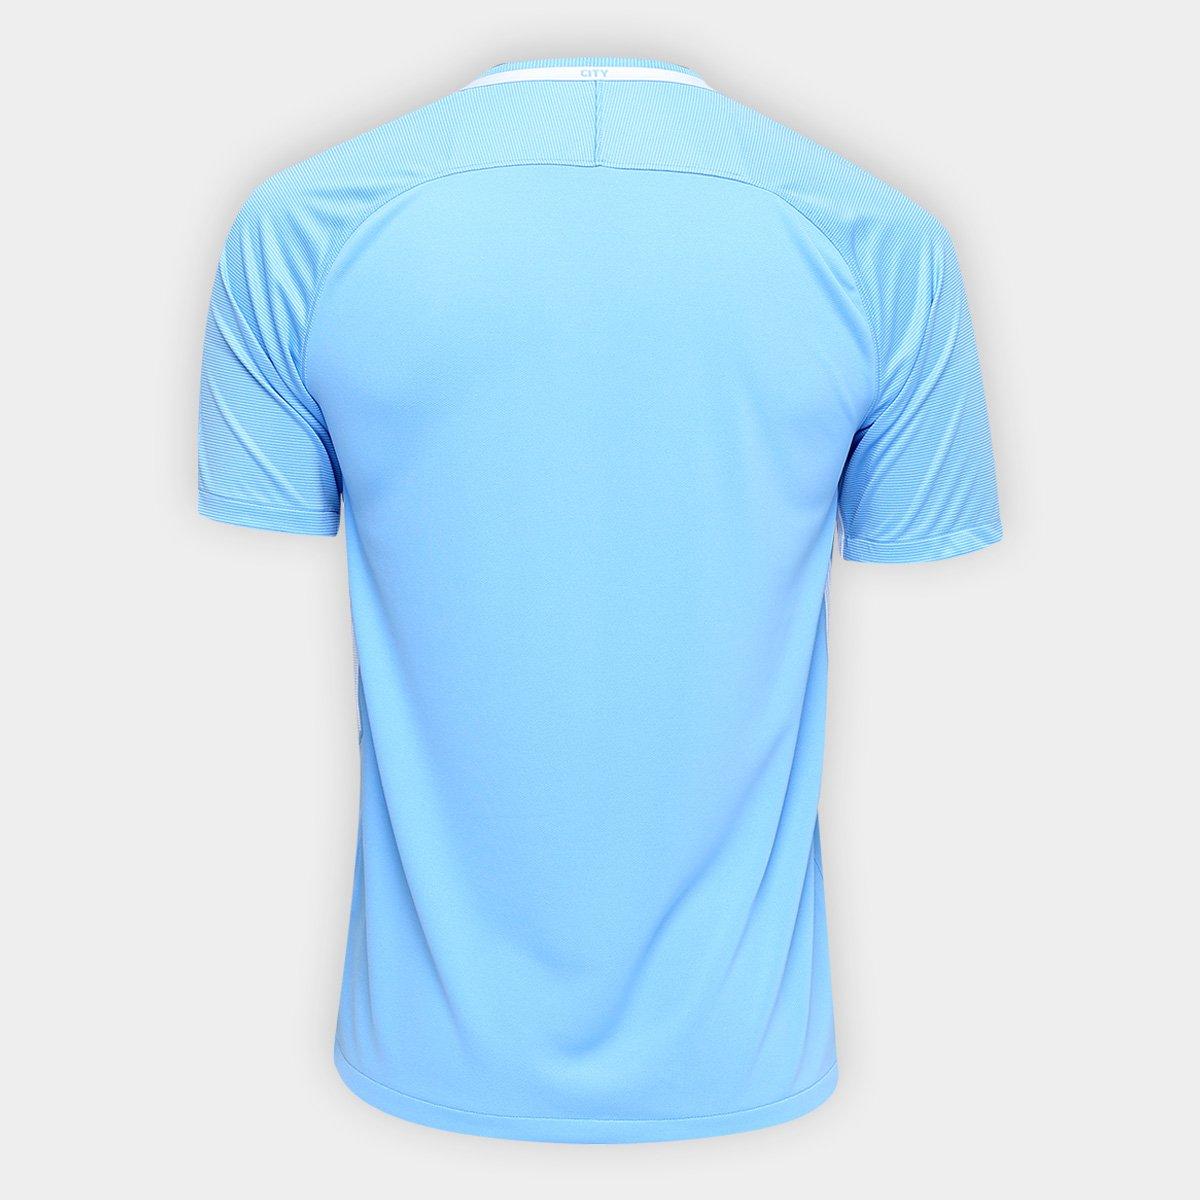 a585a26c22521 Camisa Manchester City Home 17/18 s/nº Torcedor Nike Masculina ...